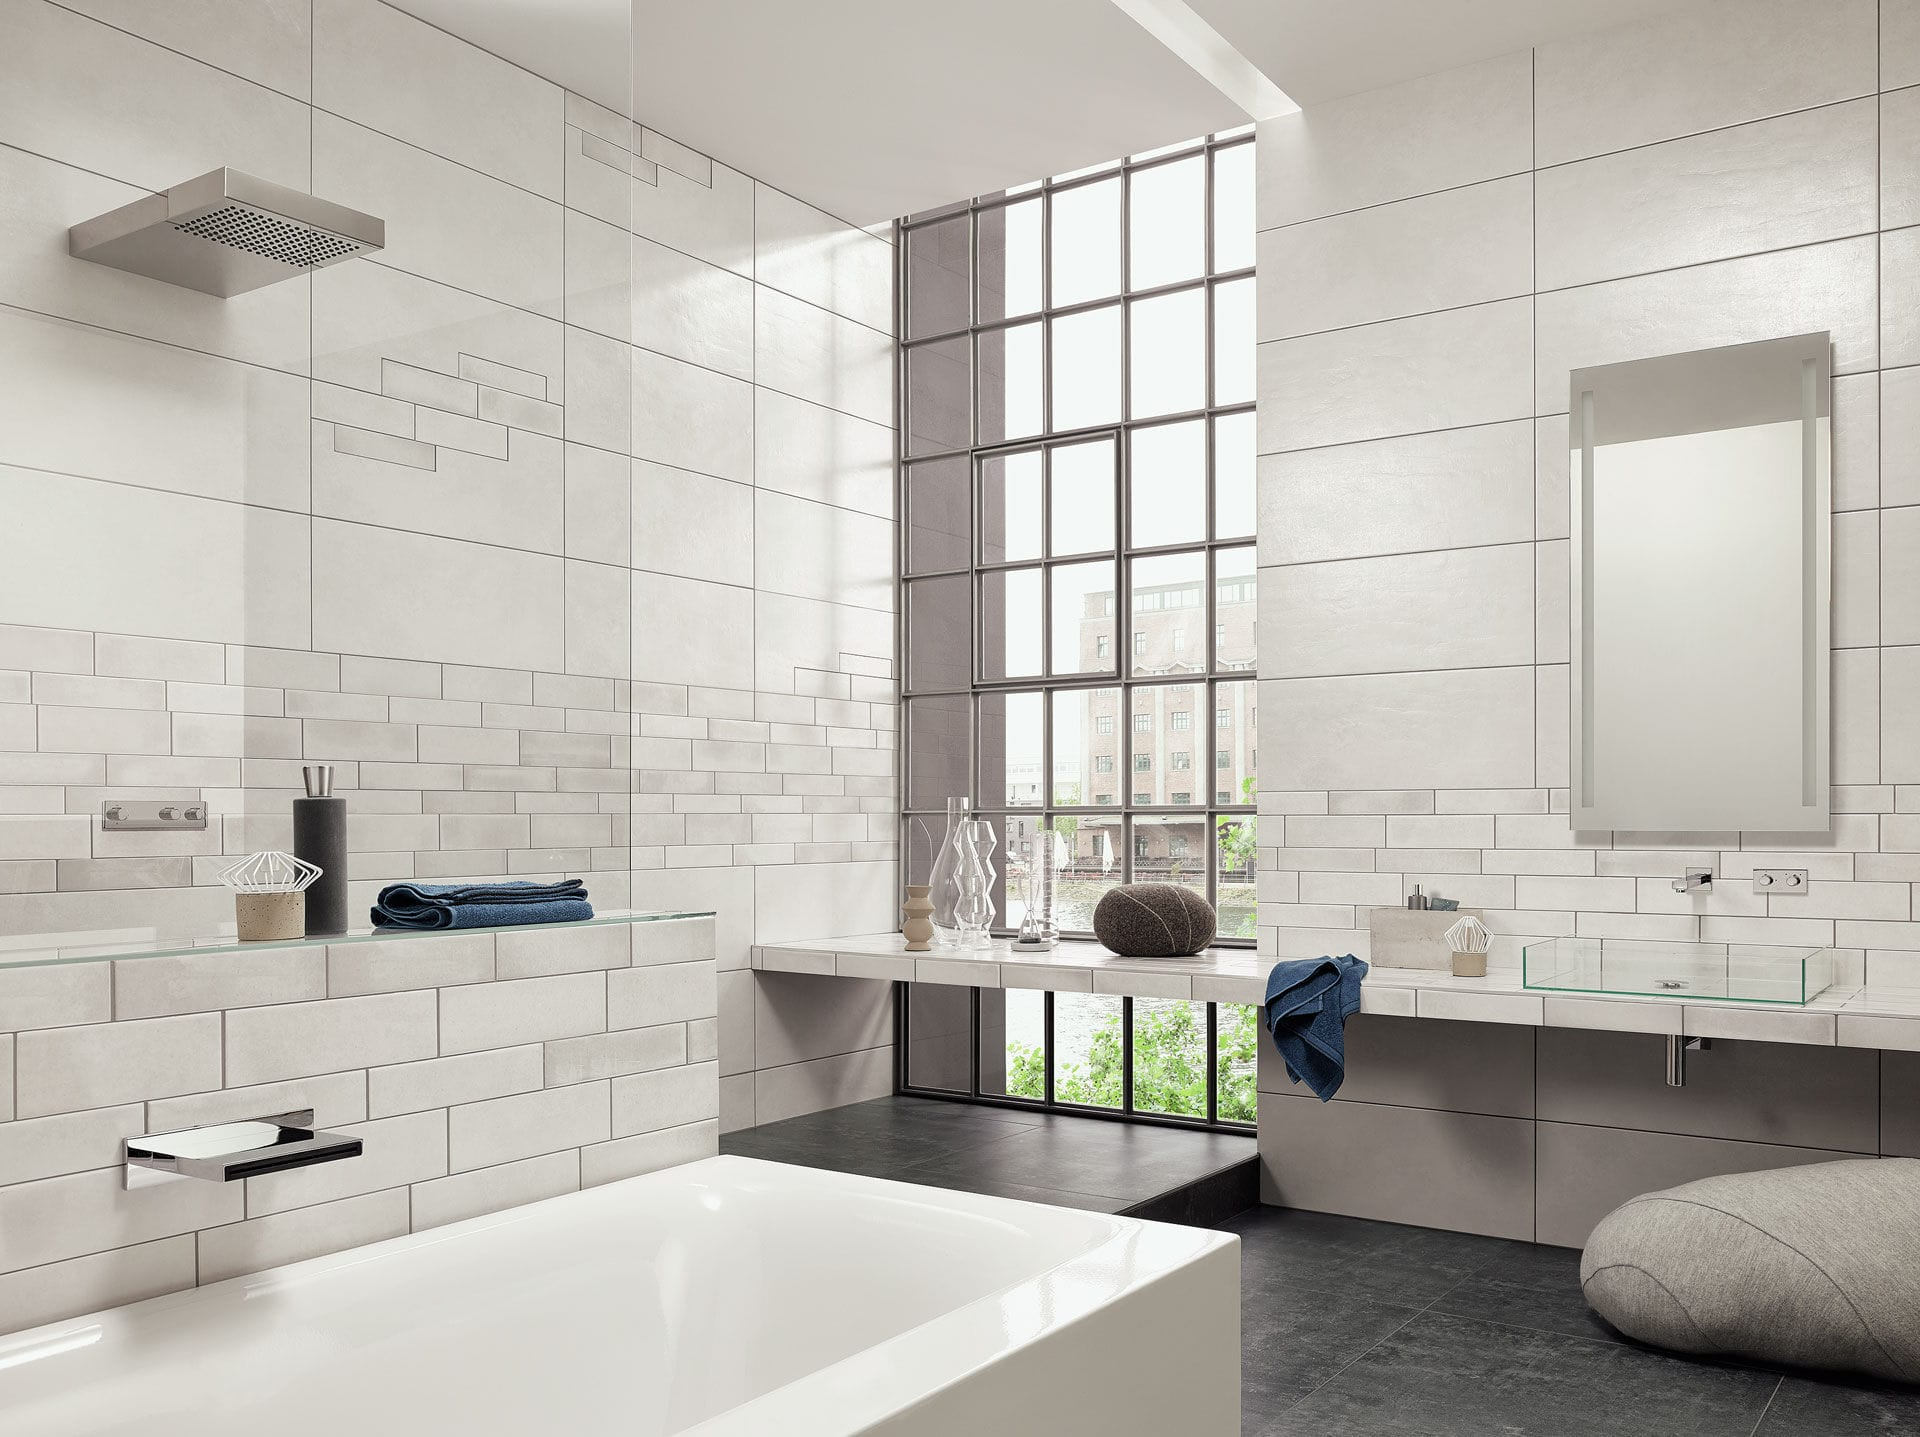 Graffiti wall tiles -  Bathroom Tile Wall Sandstone Plain Graffiti Steuler Fliesen